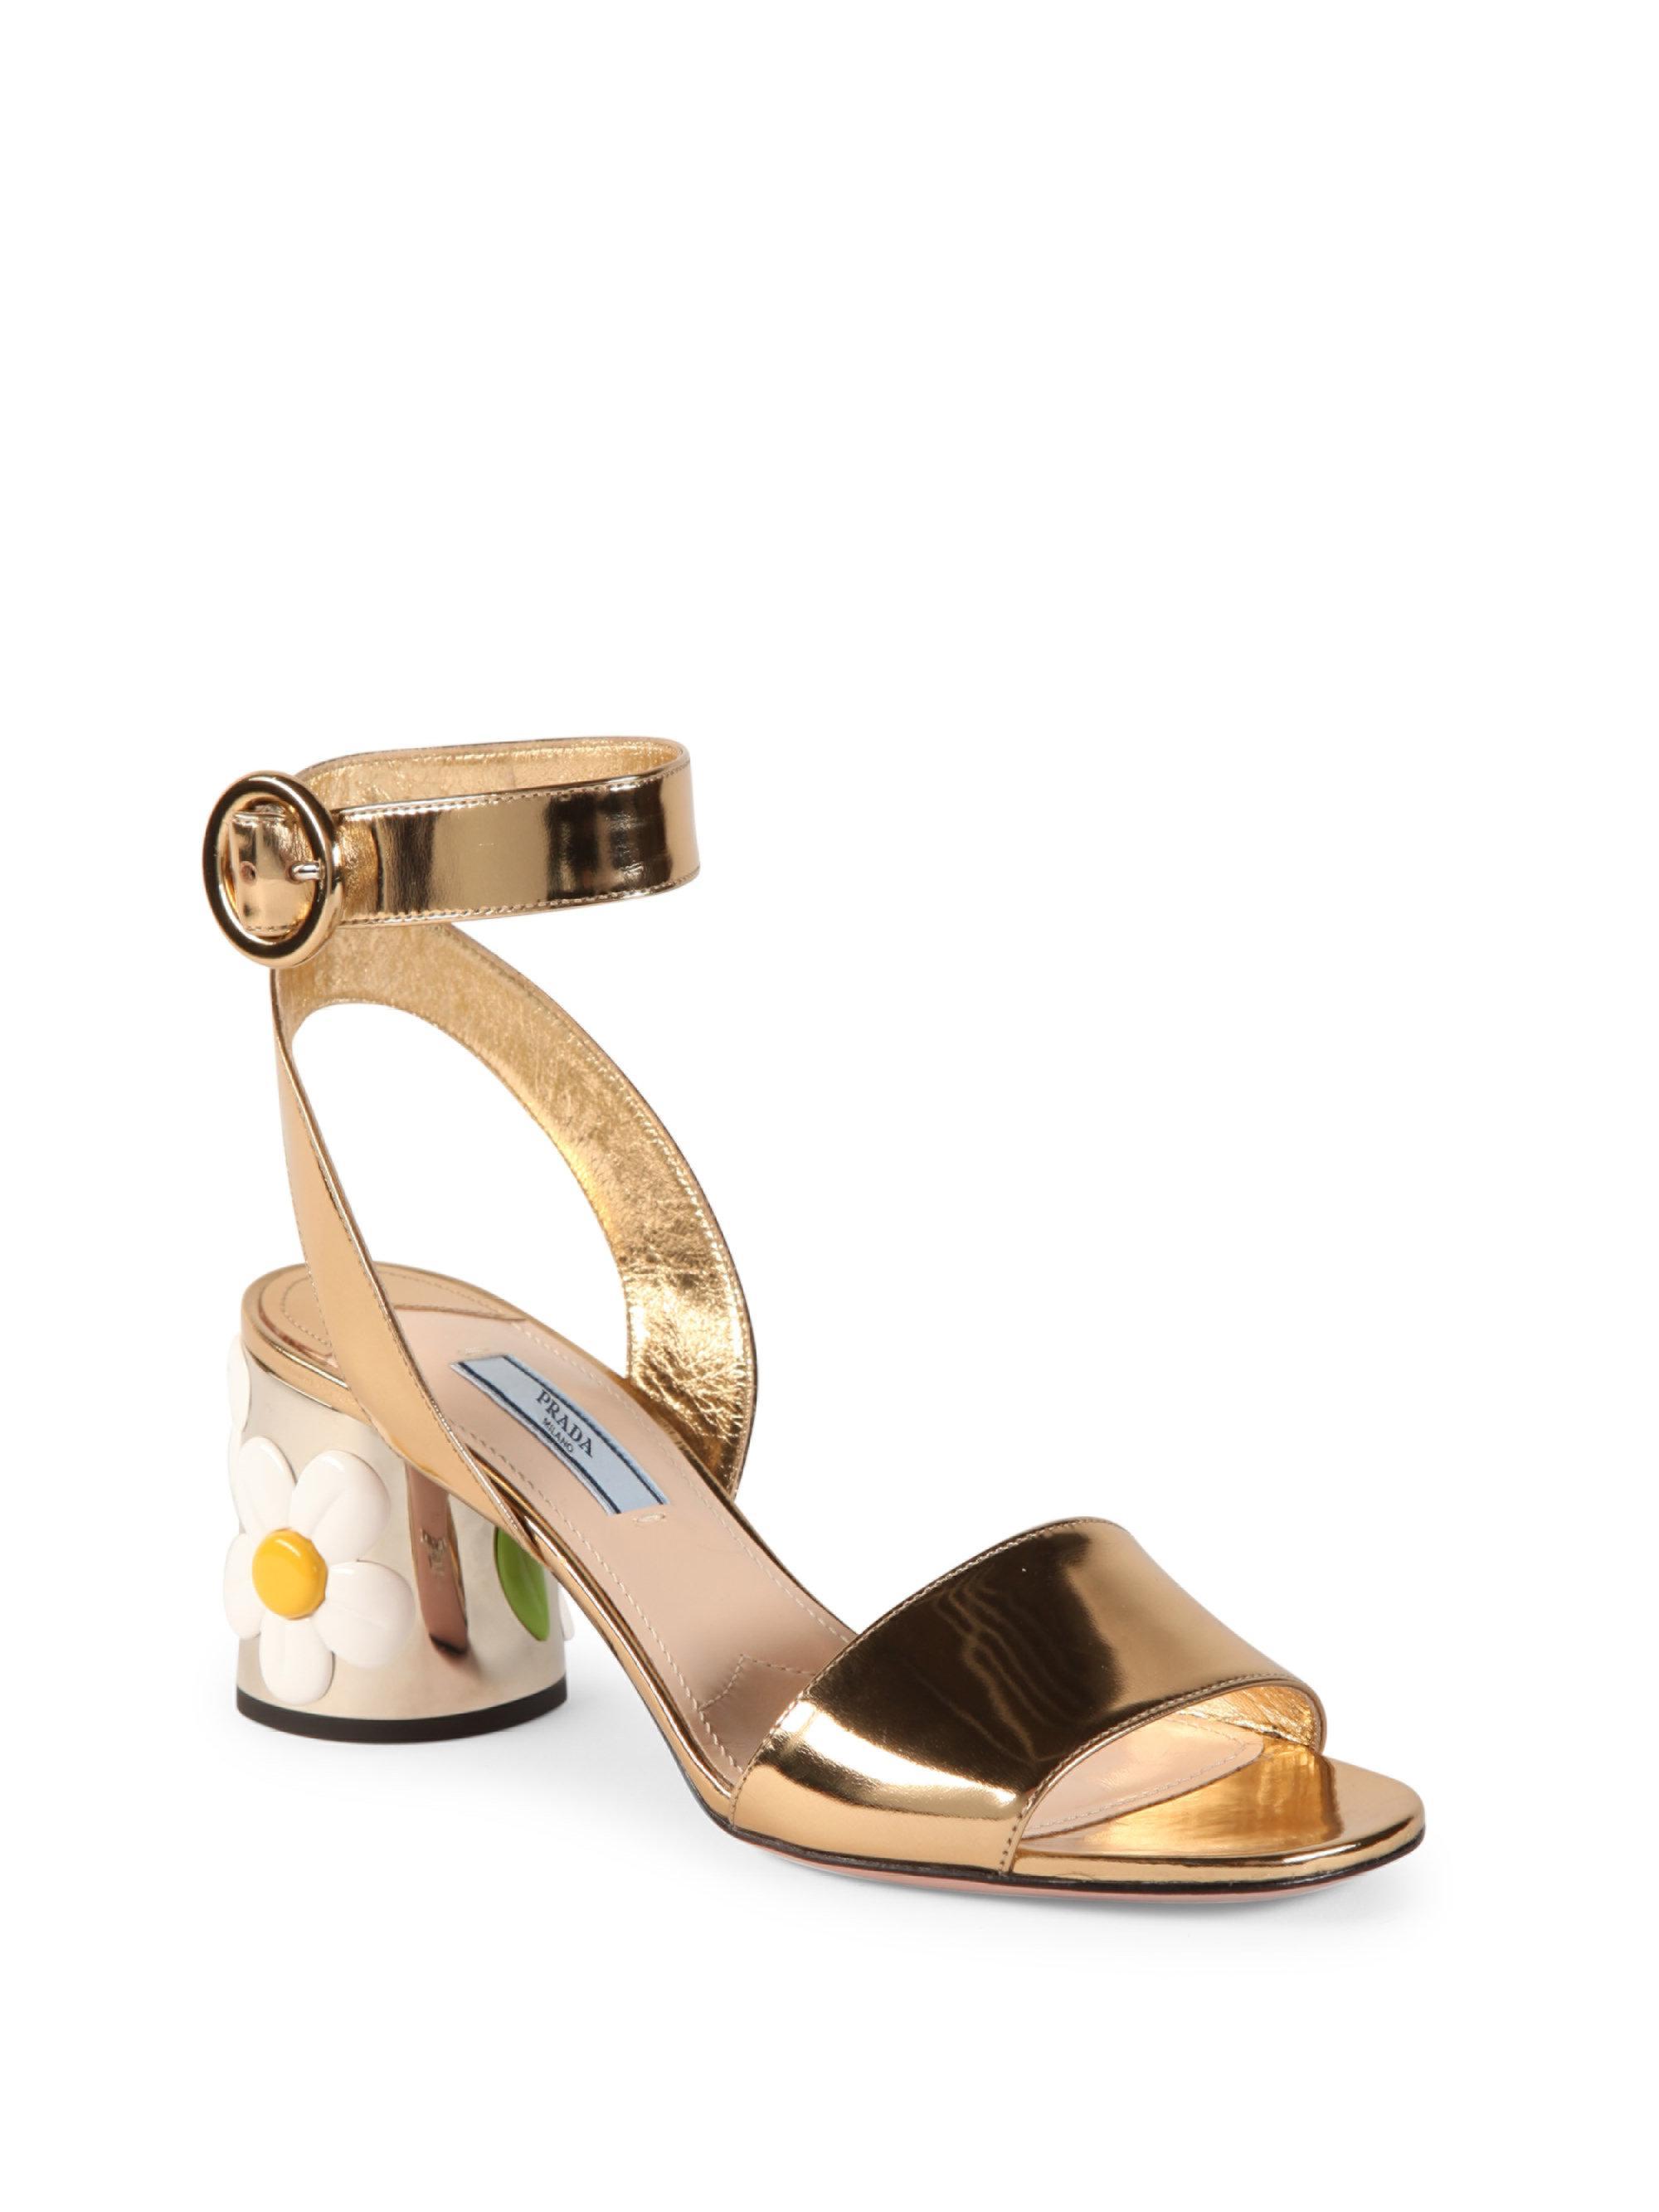 96d49e271dd1 Prada Flower-heel Metallic Leather Ankle-strap Sandals in Metallic ...